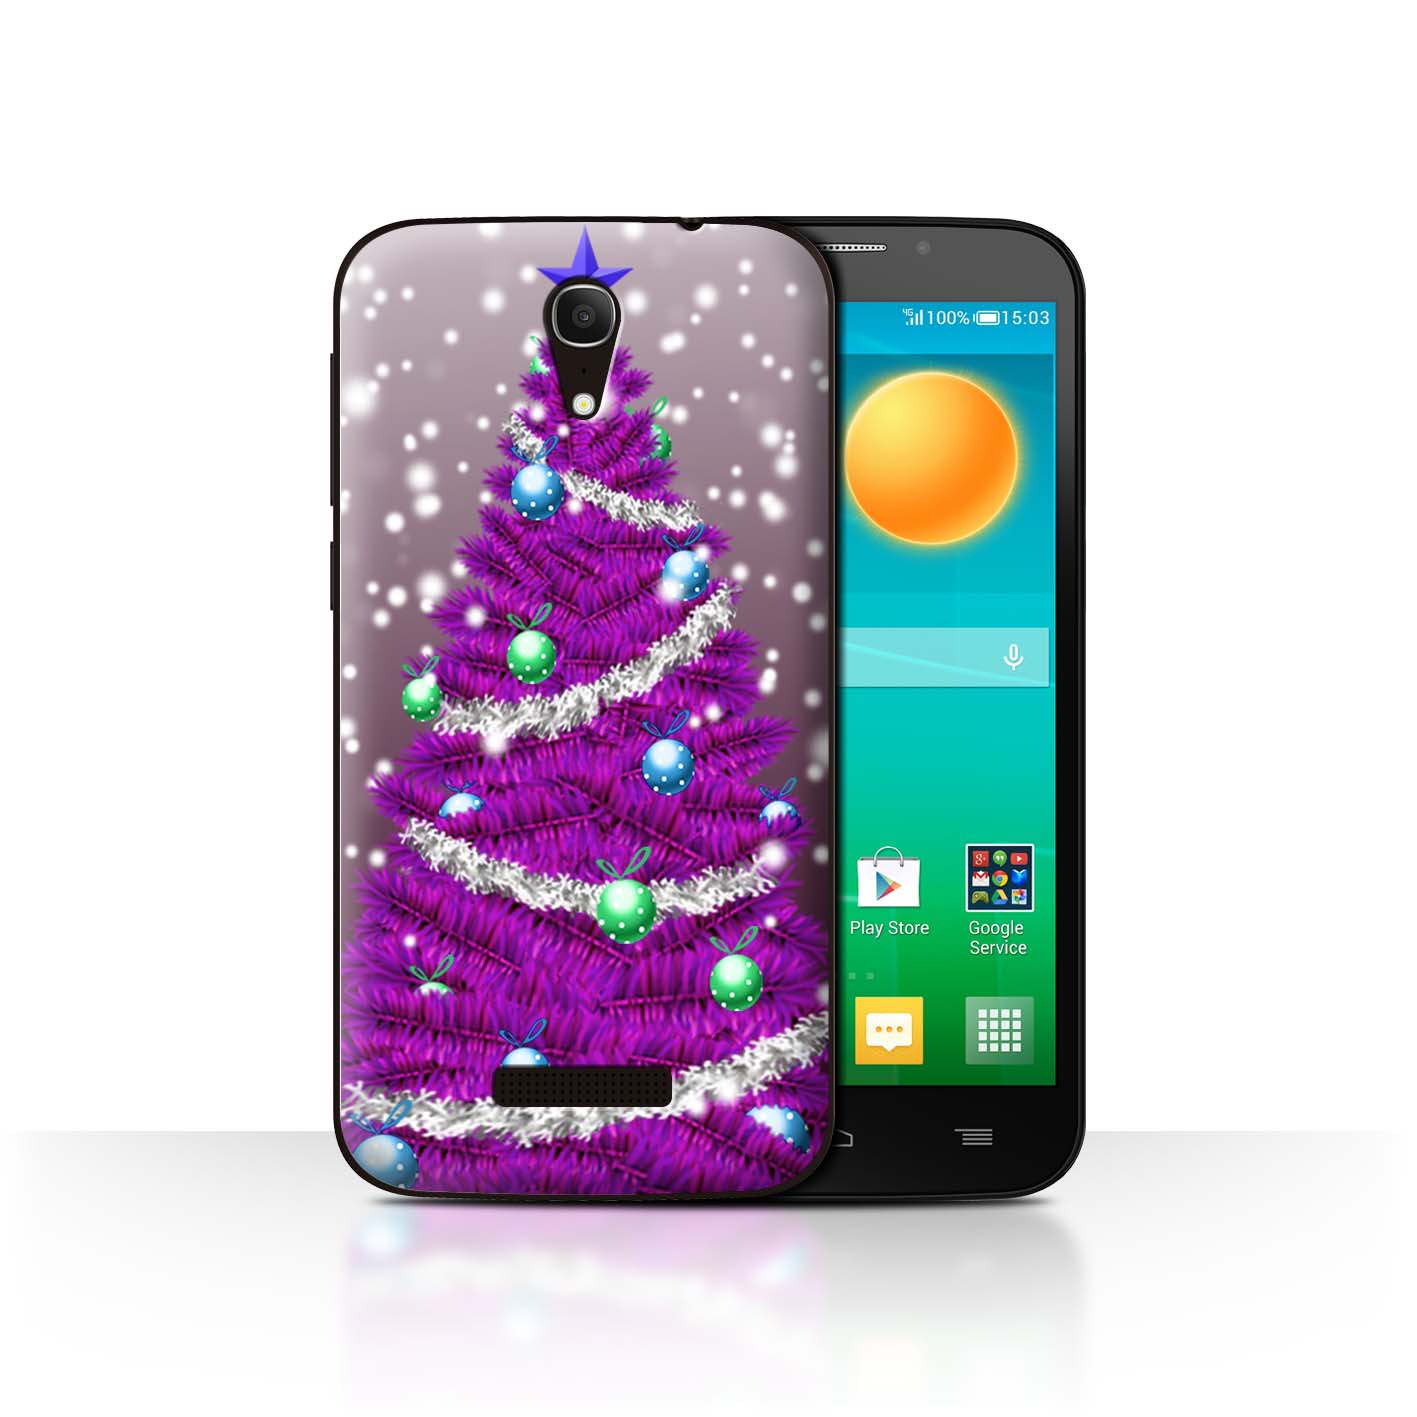 STUFF4-Back-Case-Cover-Skin-for-Alcatel-Pop-S7-Christmas-Tree